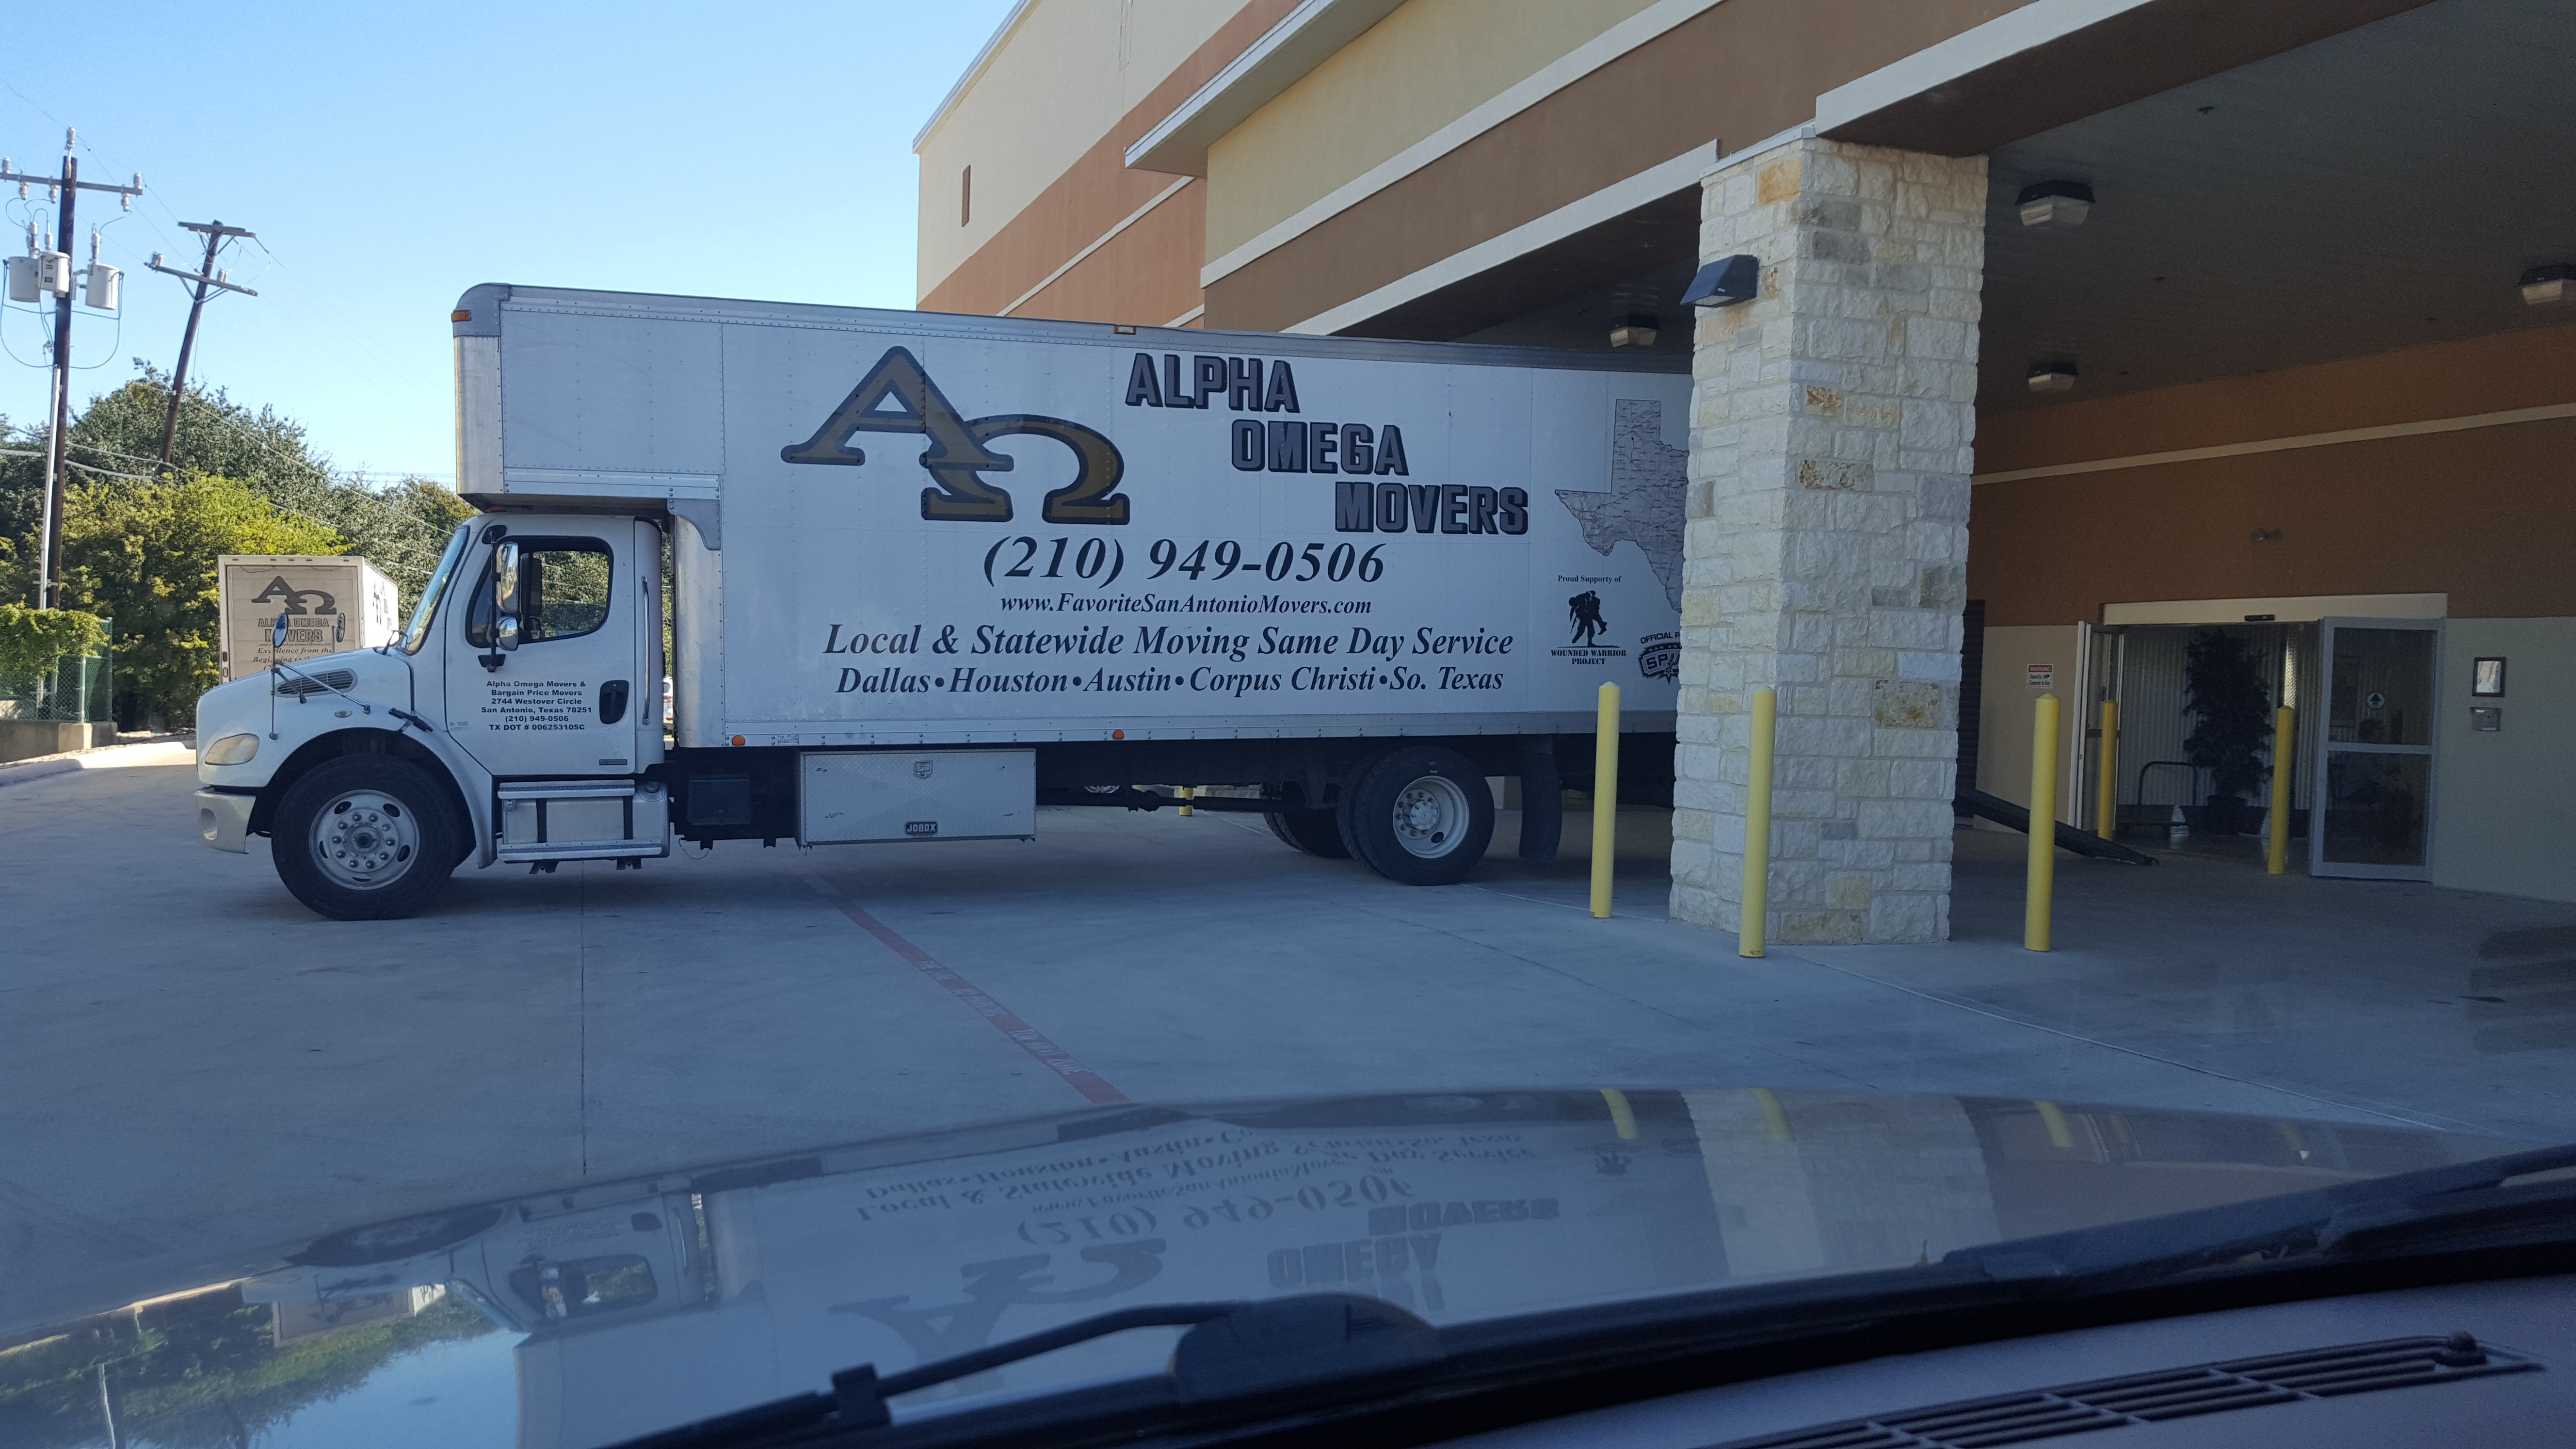 Alpha omega coupons